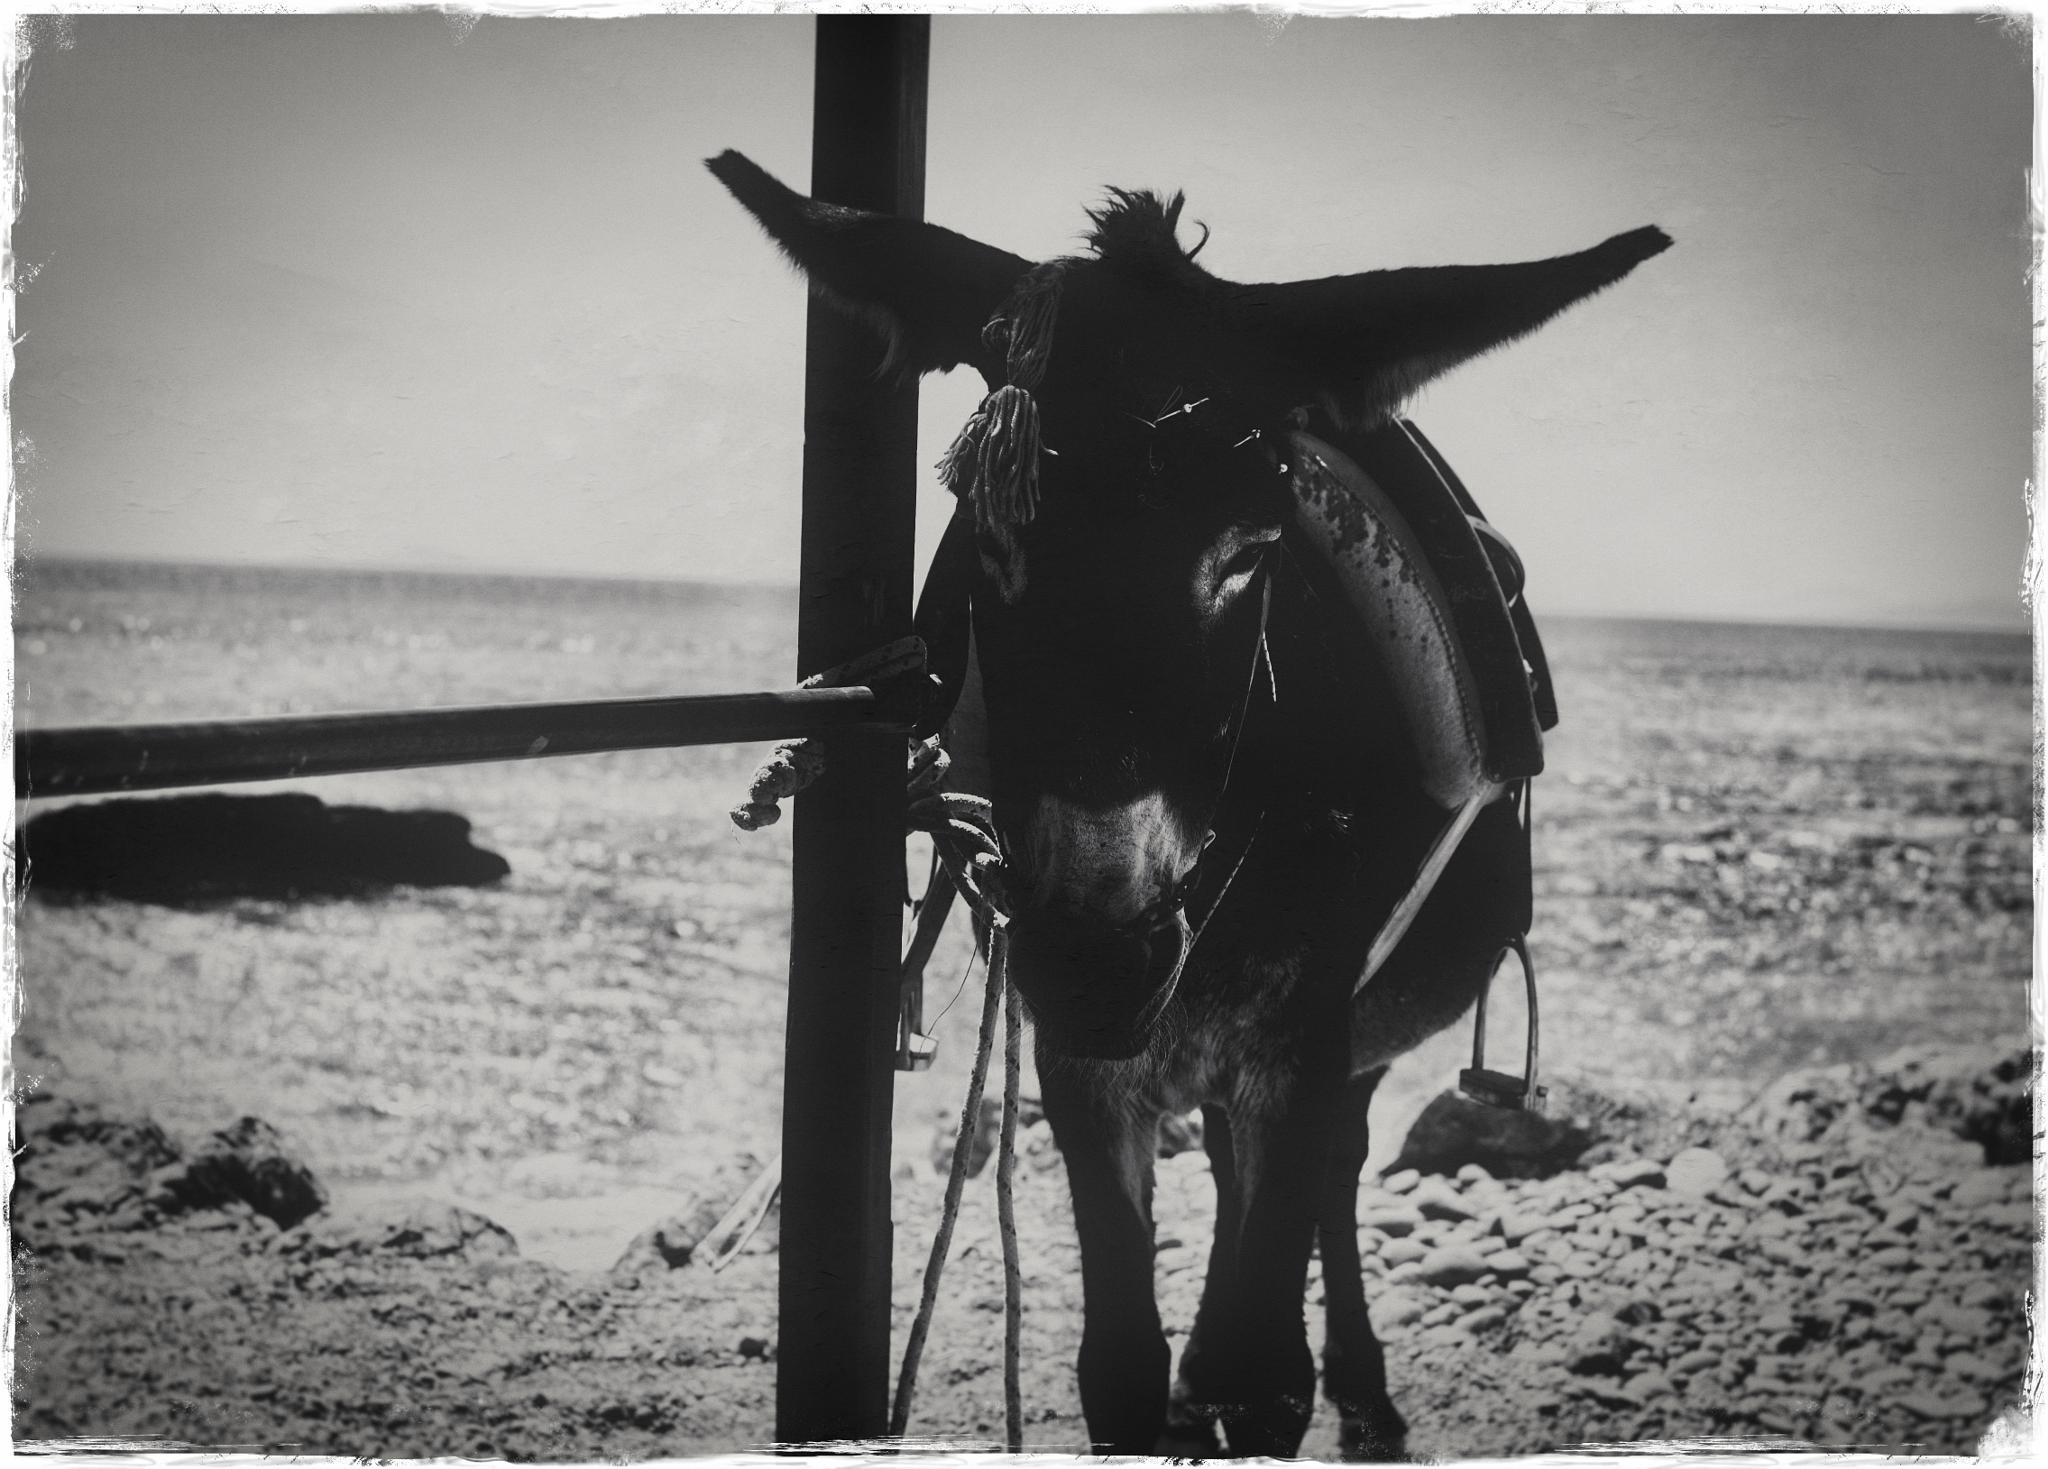 Donkey by peterkryzun